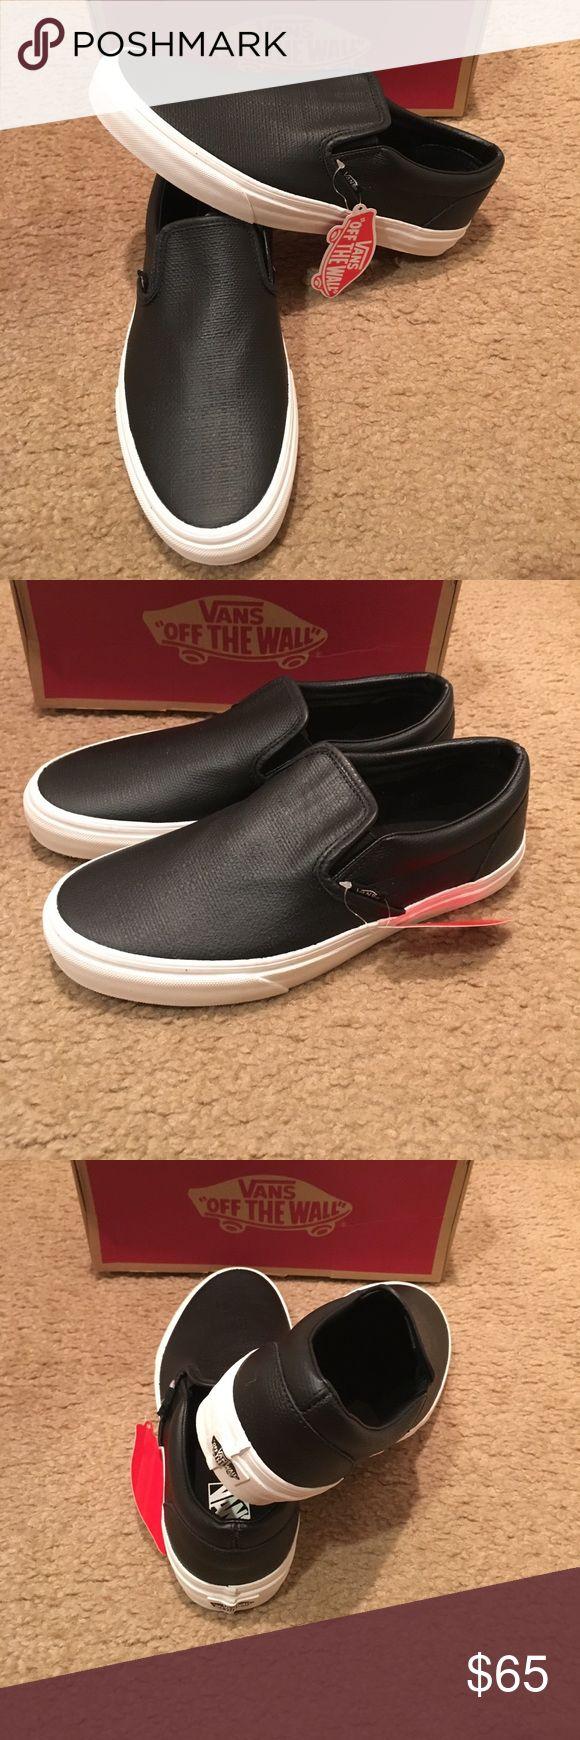 Embossed Leather Classic Slip on Vans New in box. Black Vans Shoes Sneakers